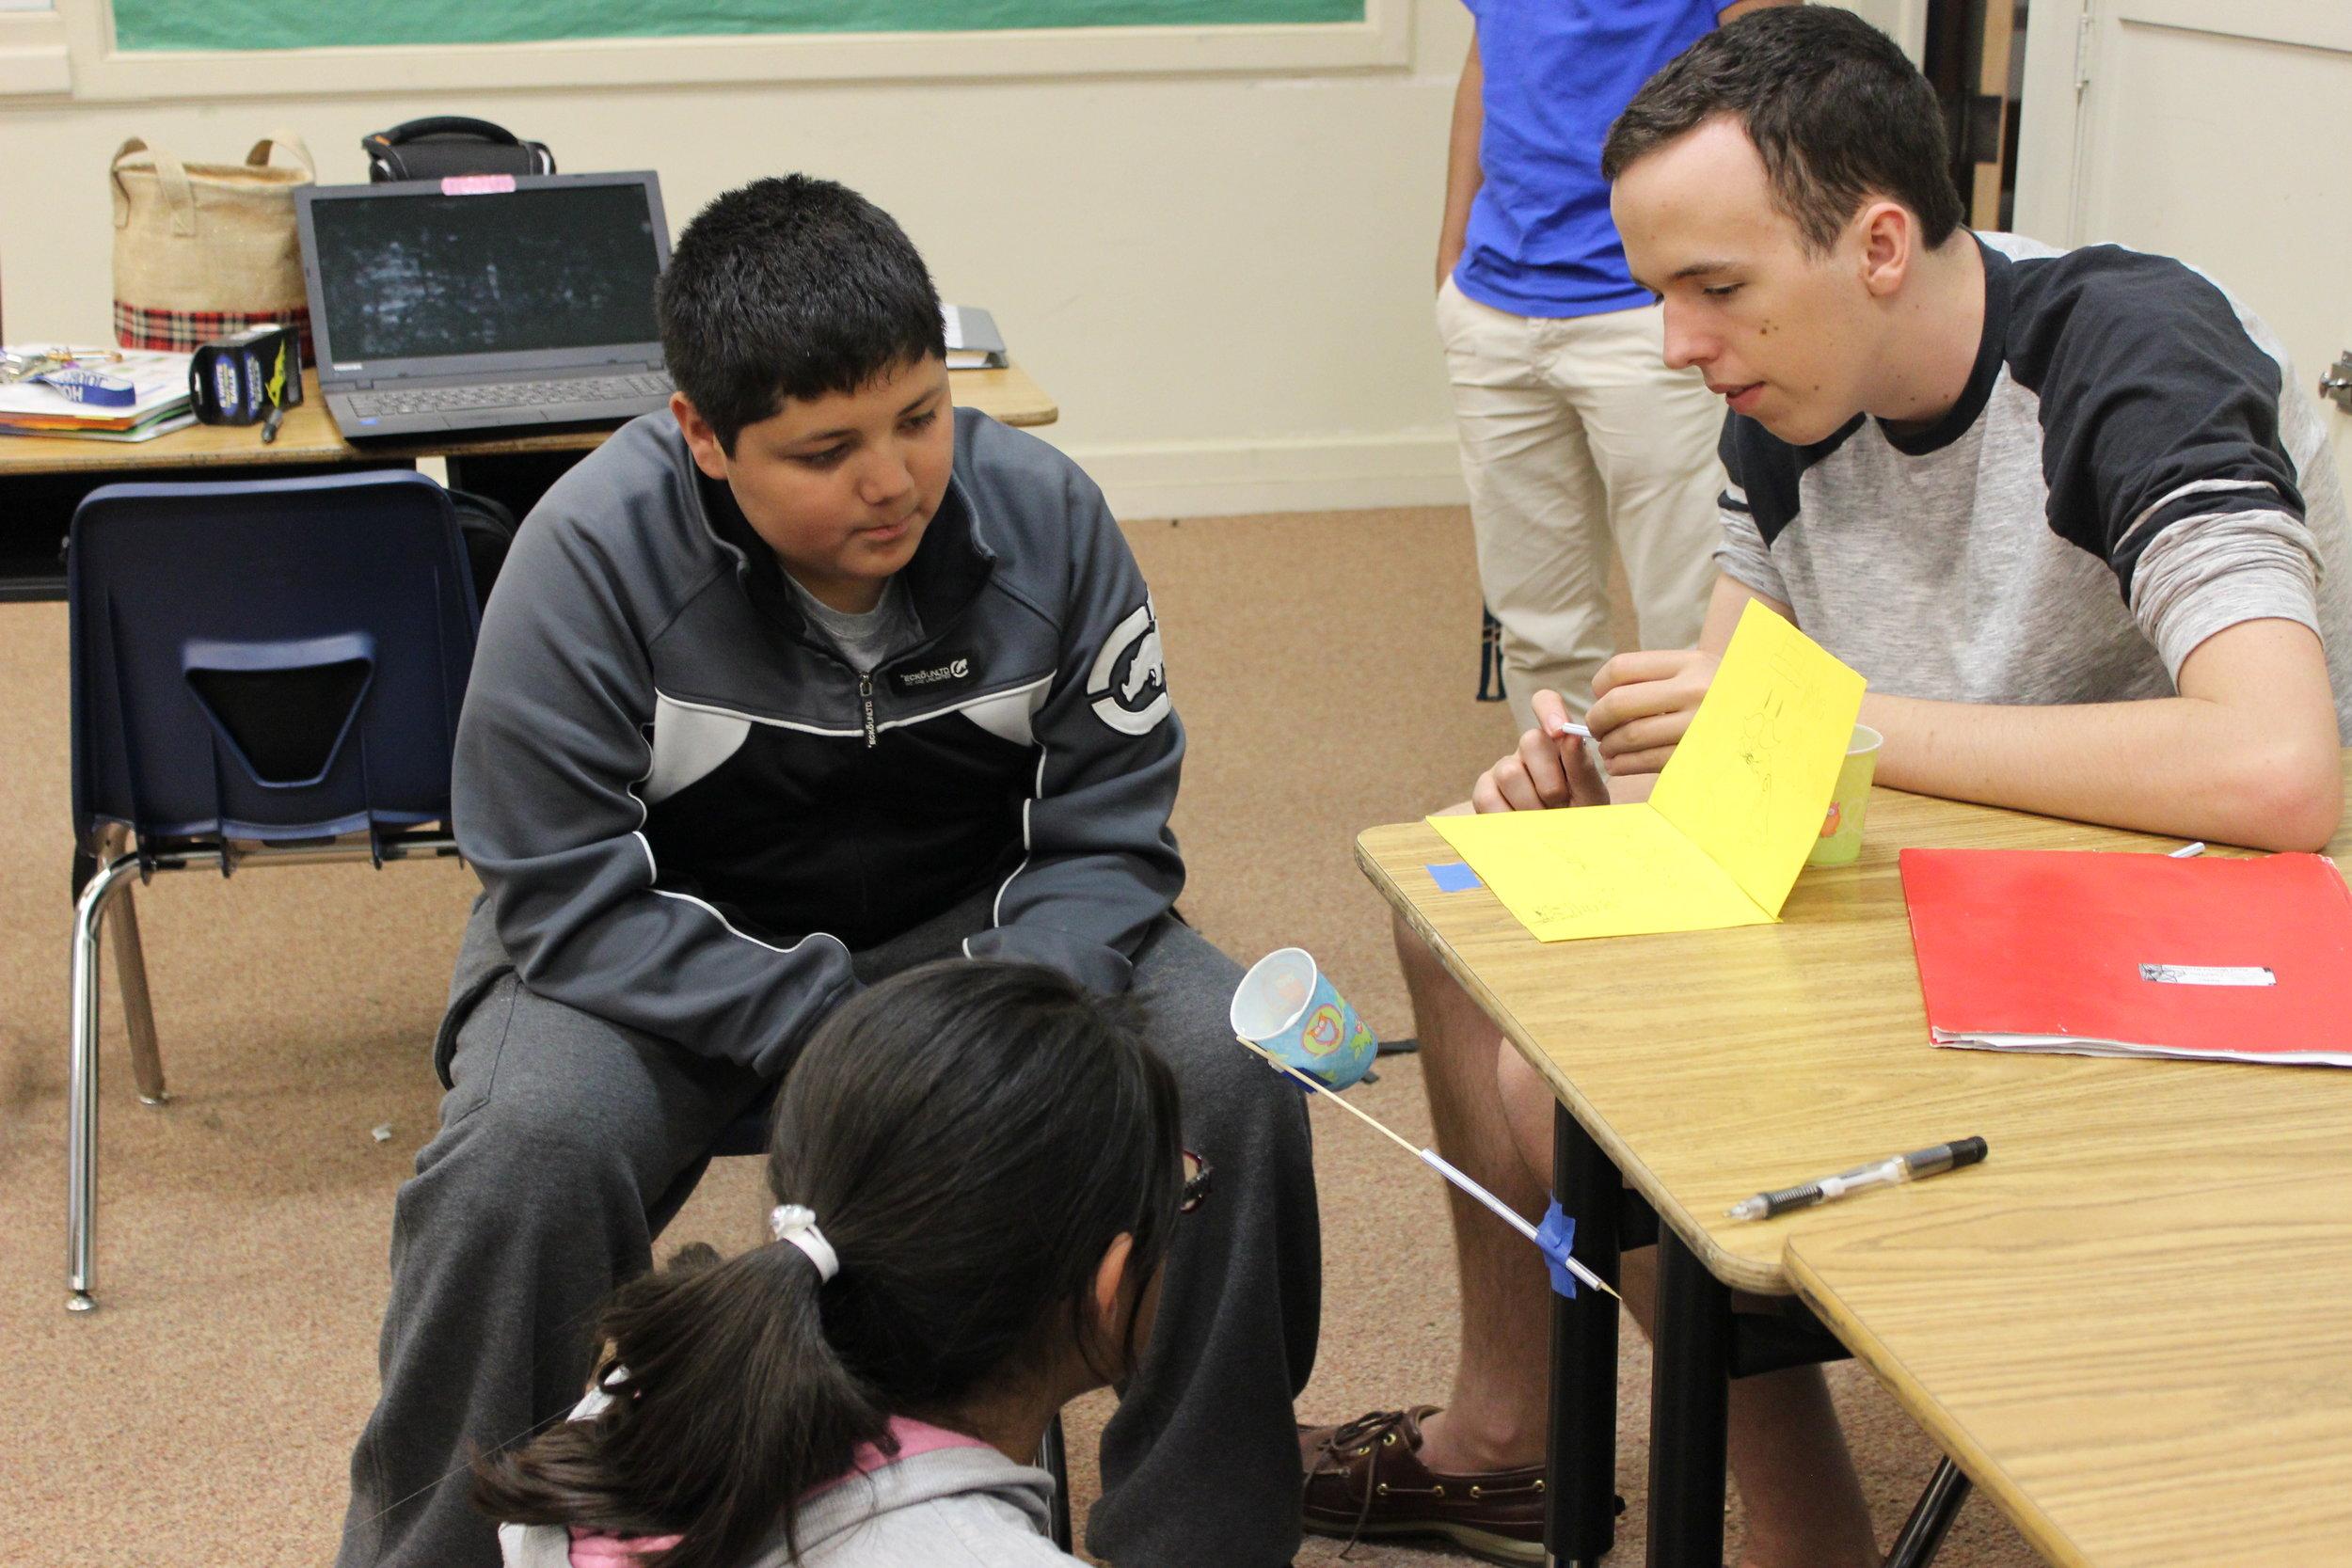 Be an After School Program Facilitator